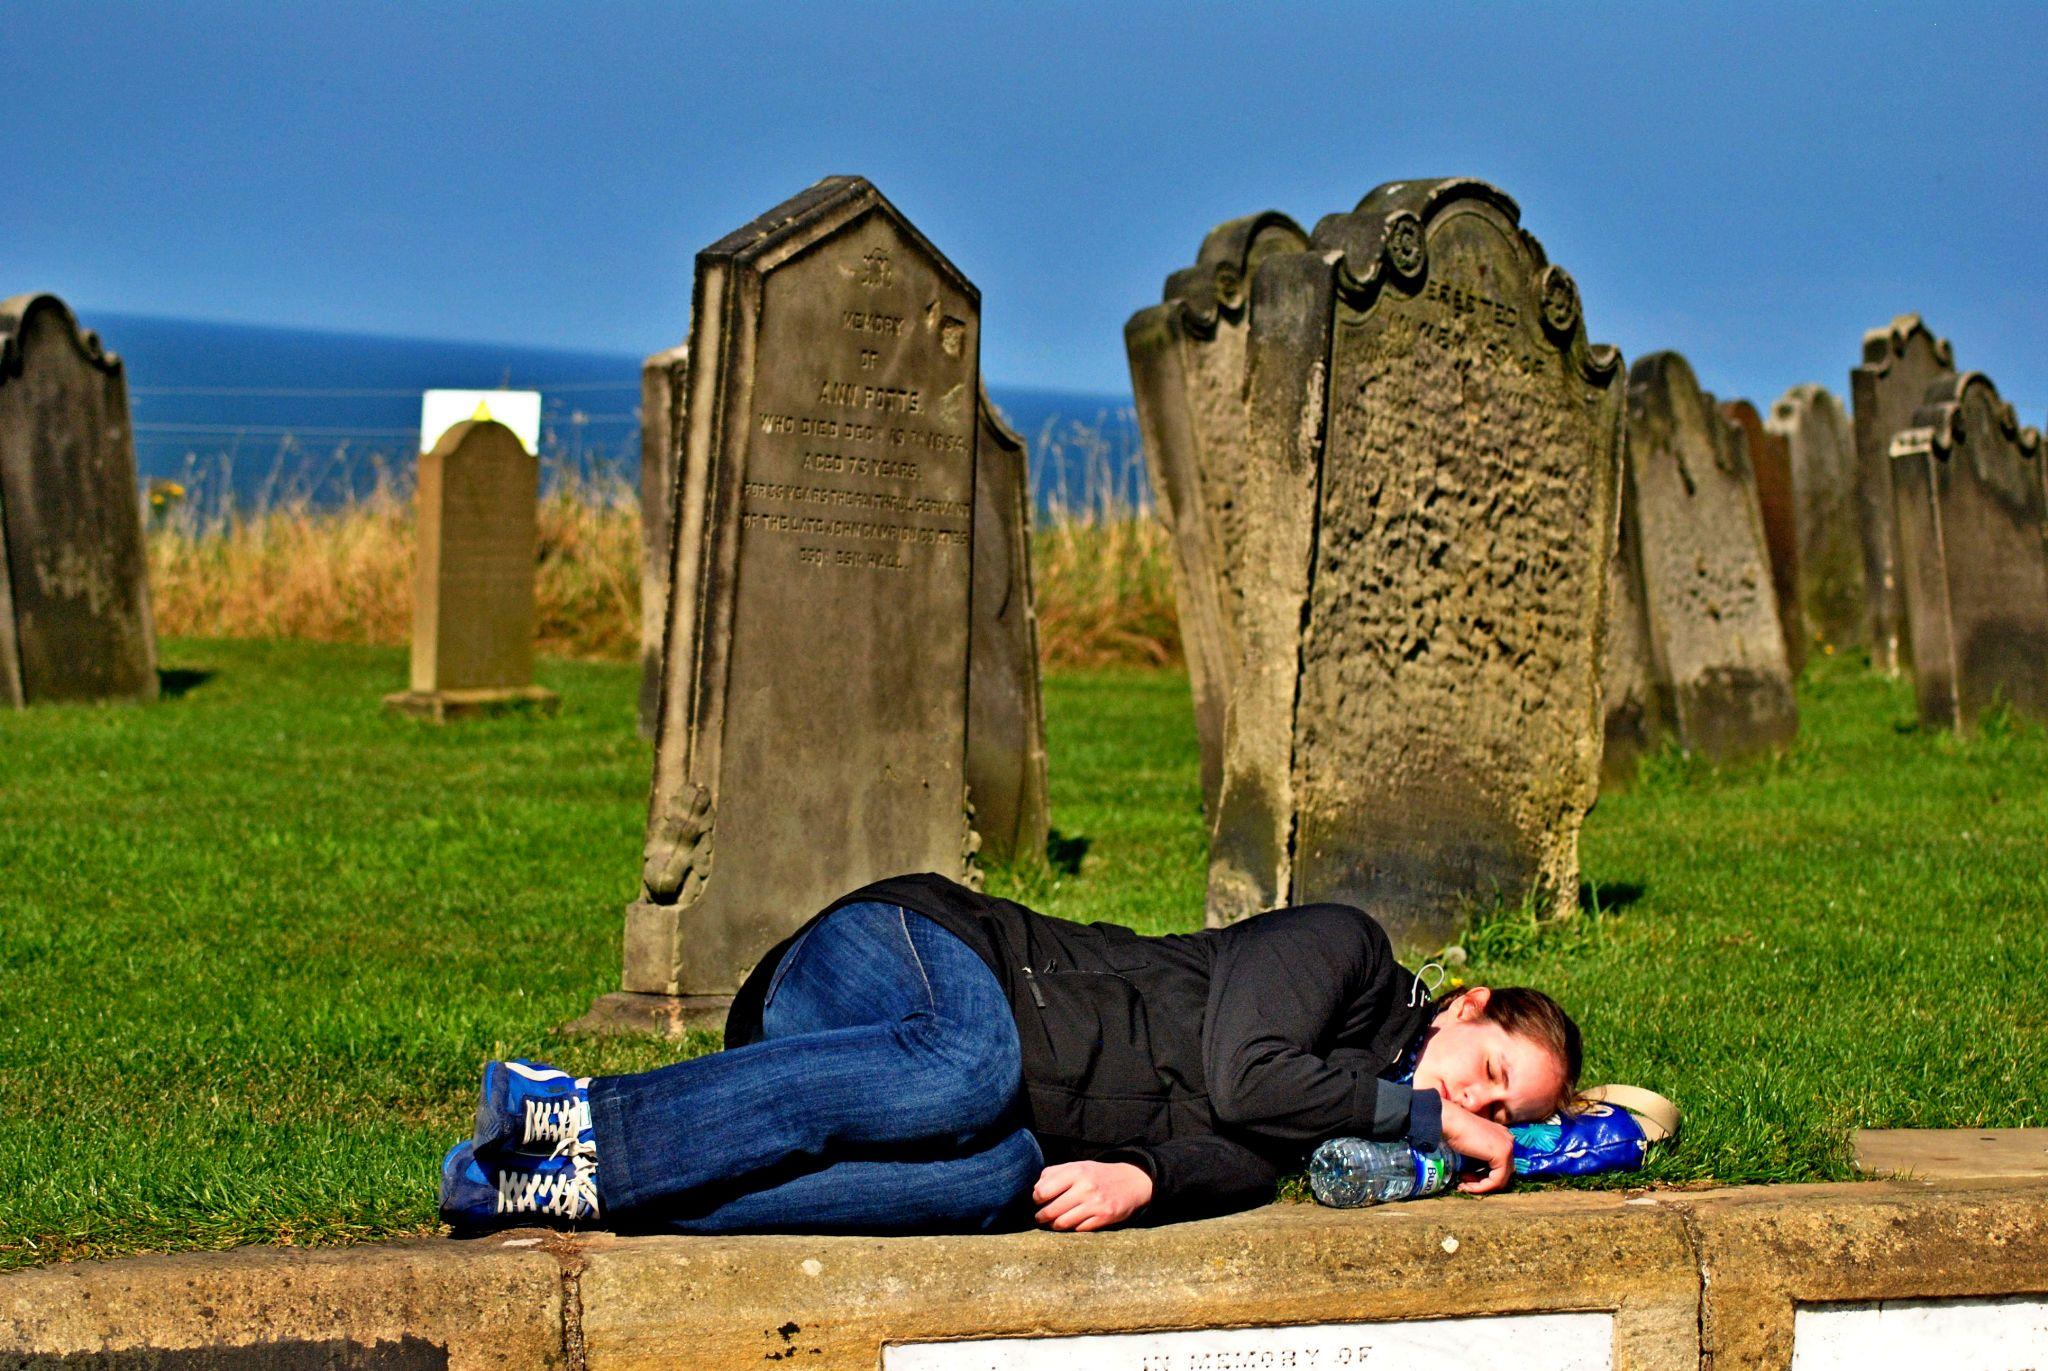 Dead  tired by gordon simpson